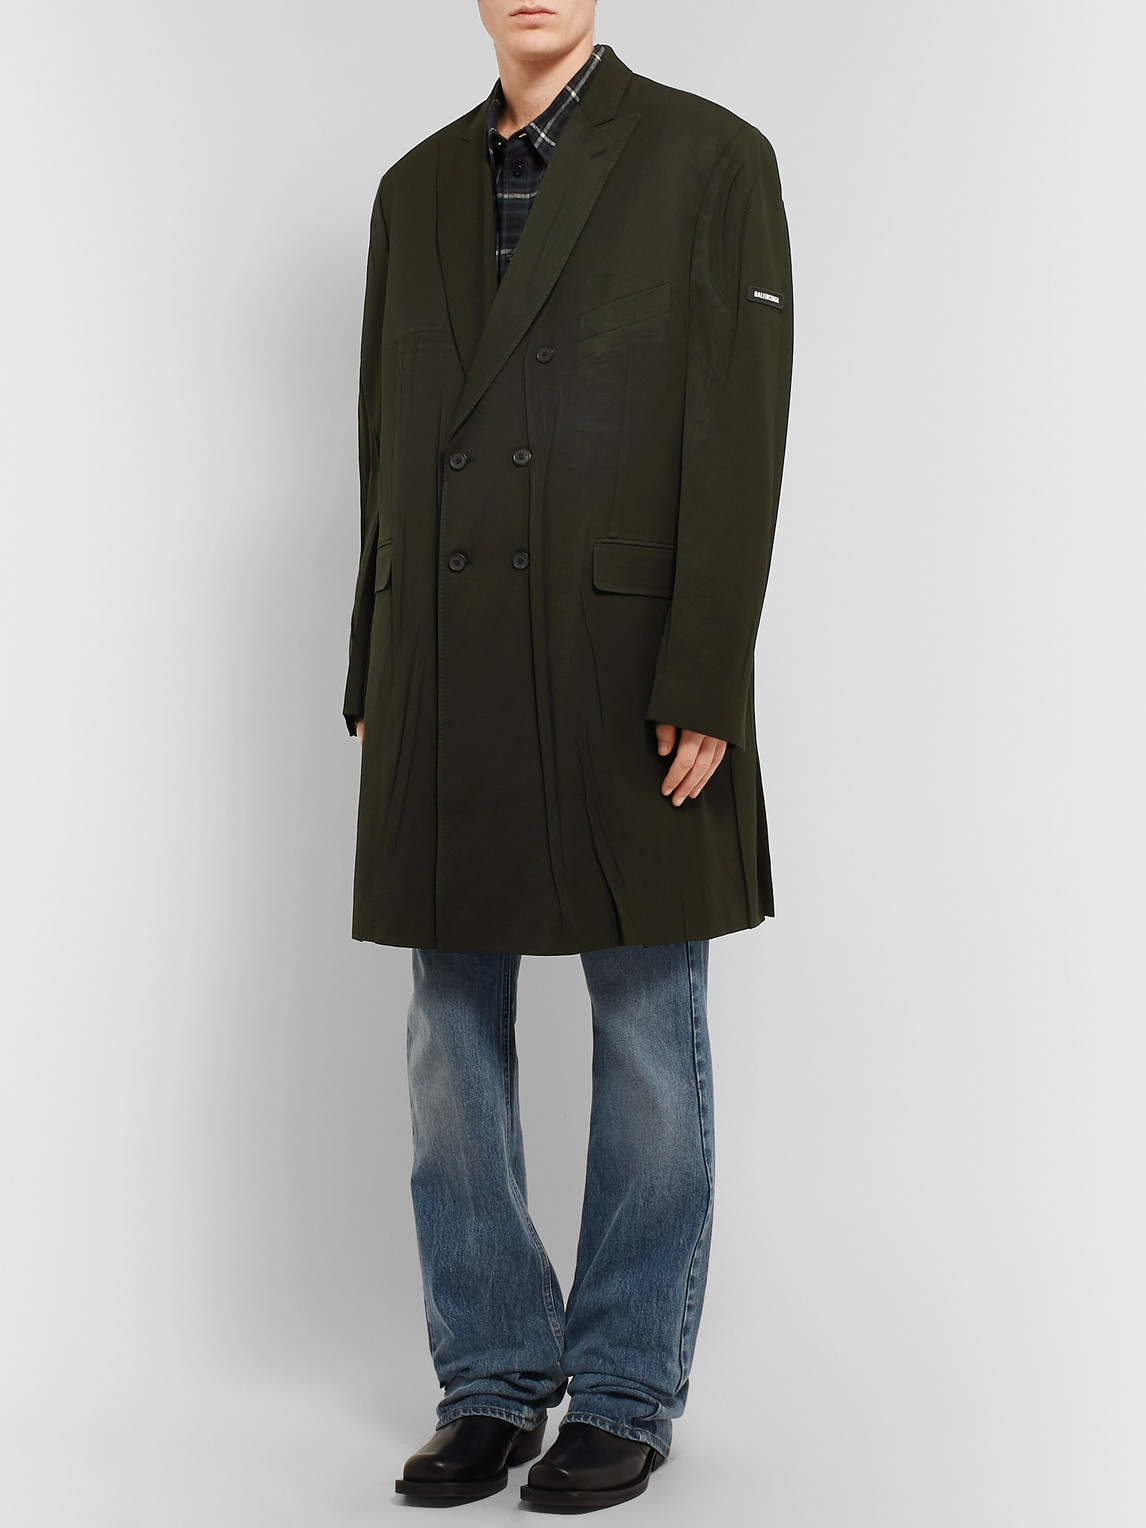 Balenciaga Coats DOUBLE-BREASTED CREASED WOOL-BLEND TWILL COAT